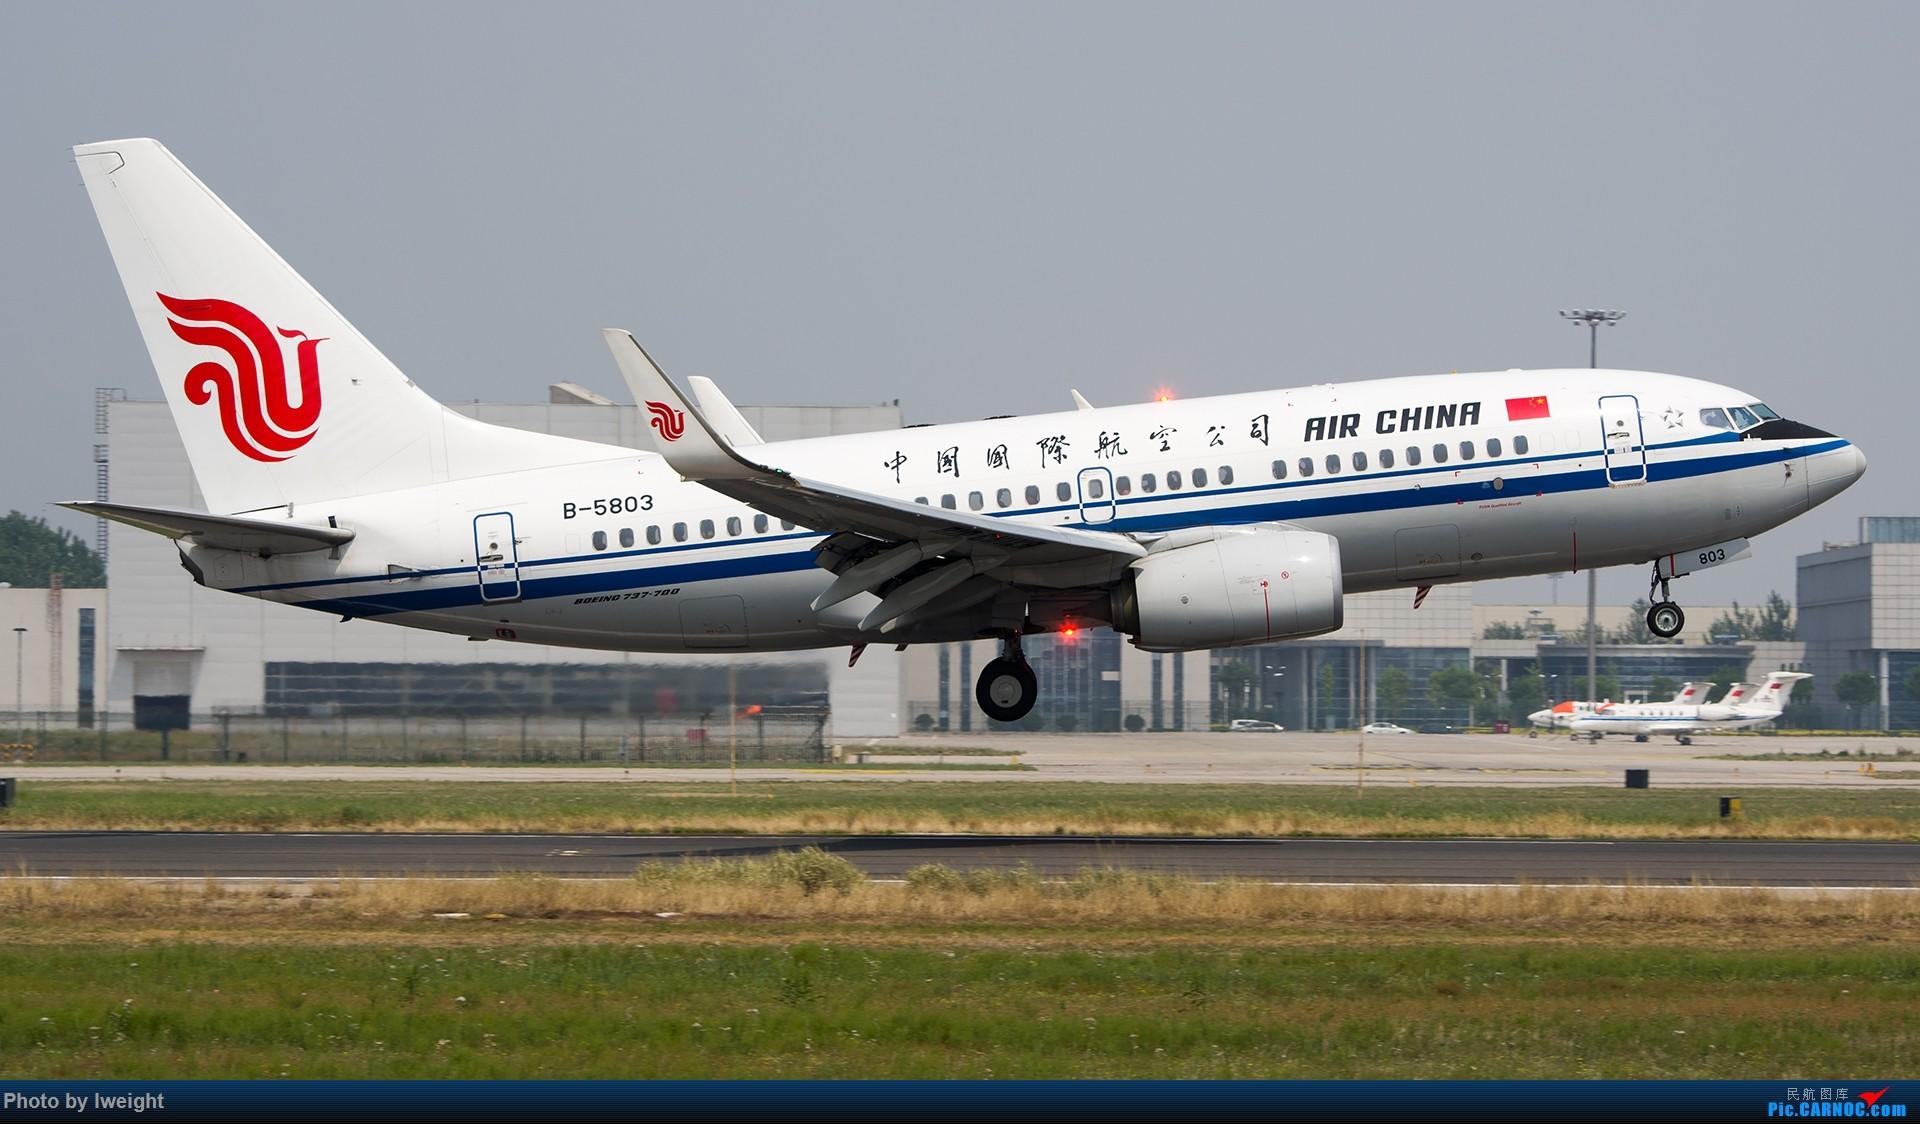 Re:[原创]周末帝都霾天拍机,凑合看看吧【2015-5-23】 BOEING 737-700 B-5803 中国北京首都国际机场